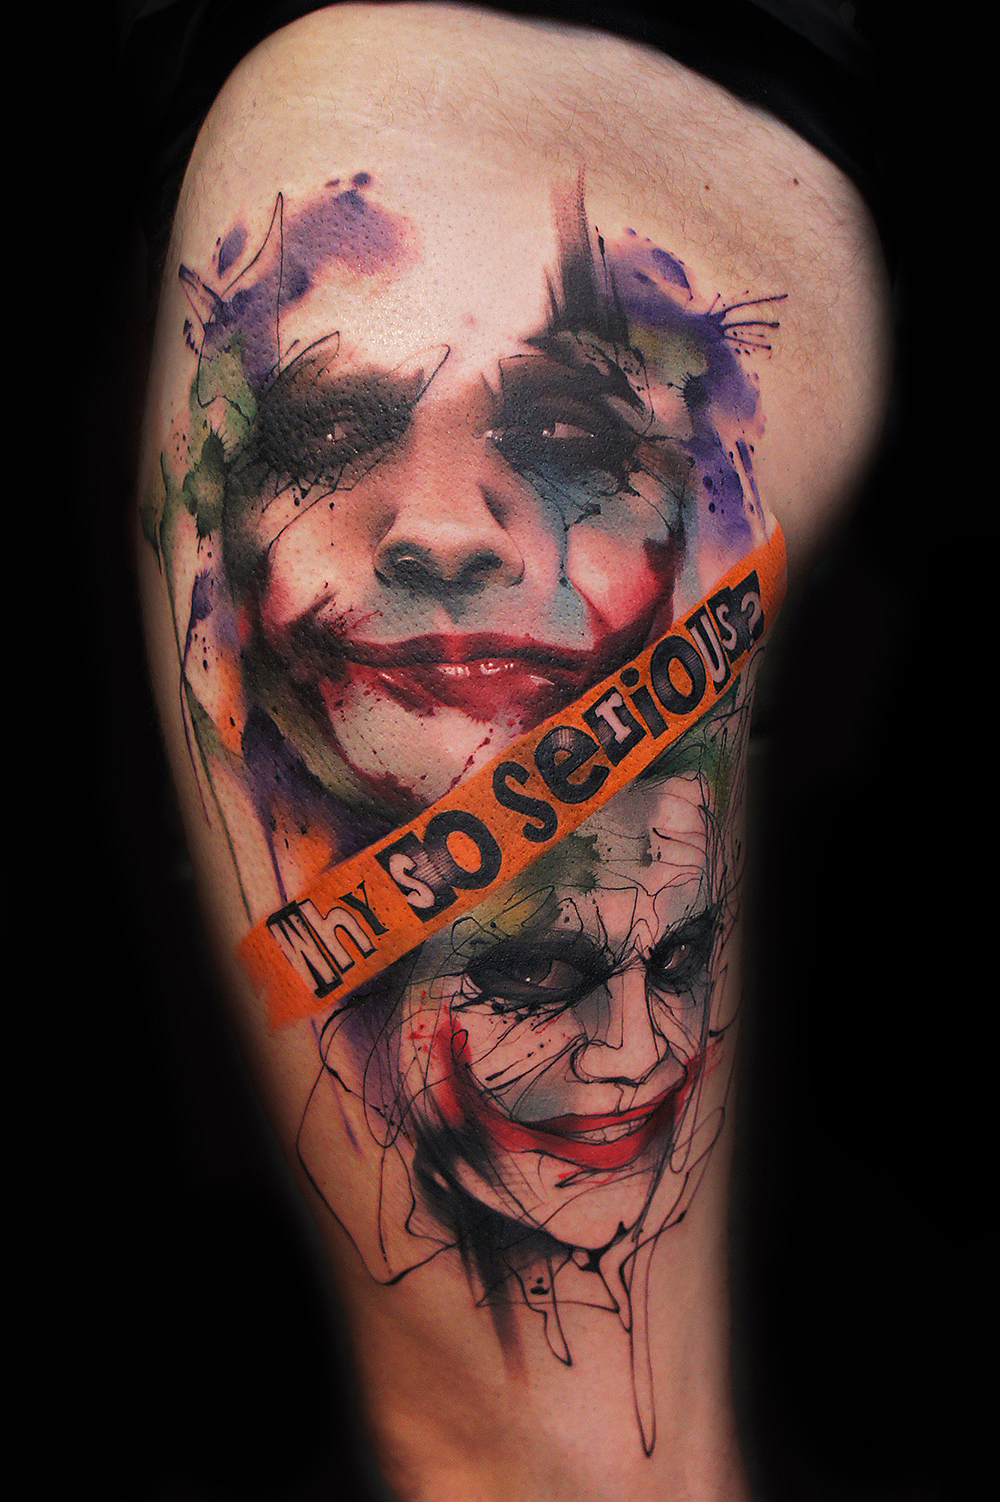 Joker tattoo vector black and white stock Joker tattoo by Jay Freestyle | Tattoo.com vector black and white stock